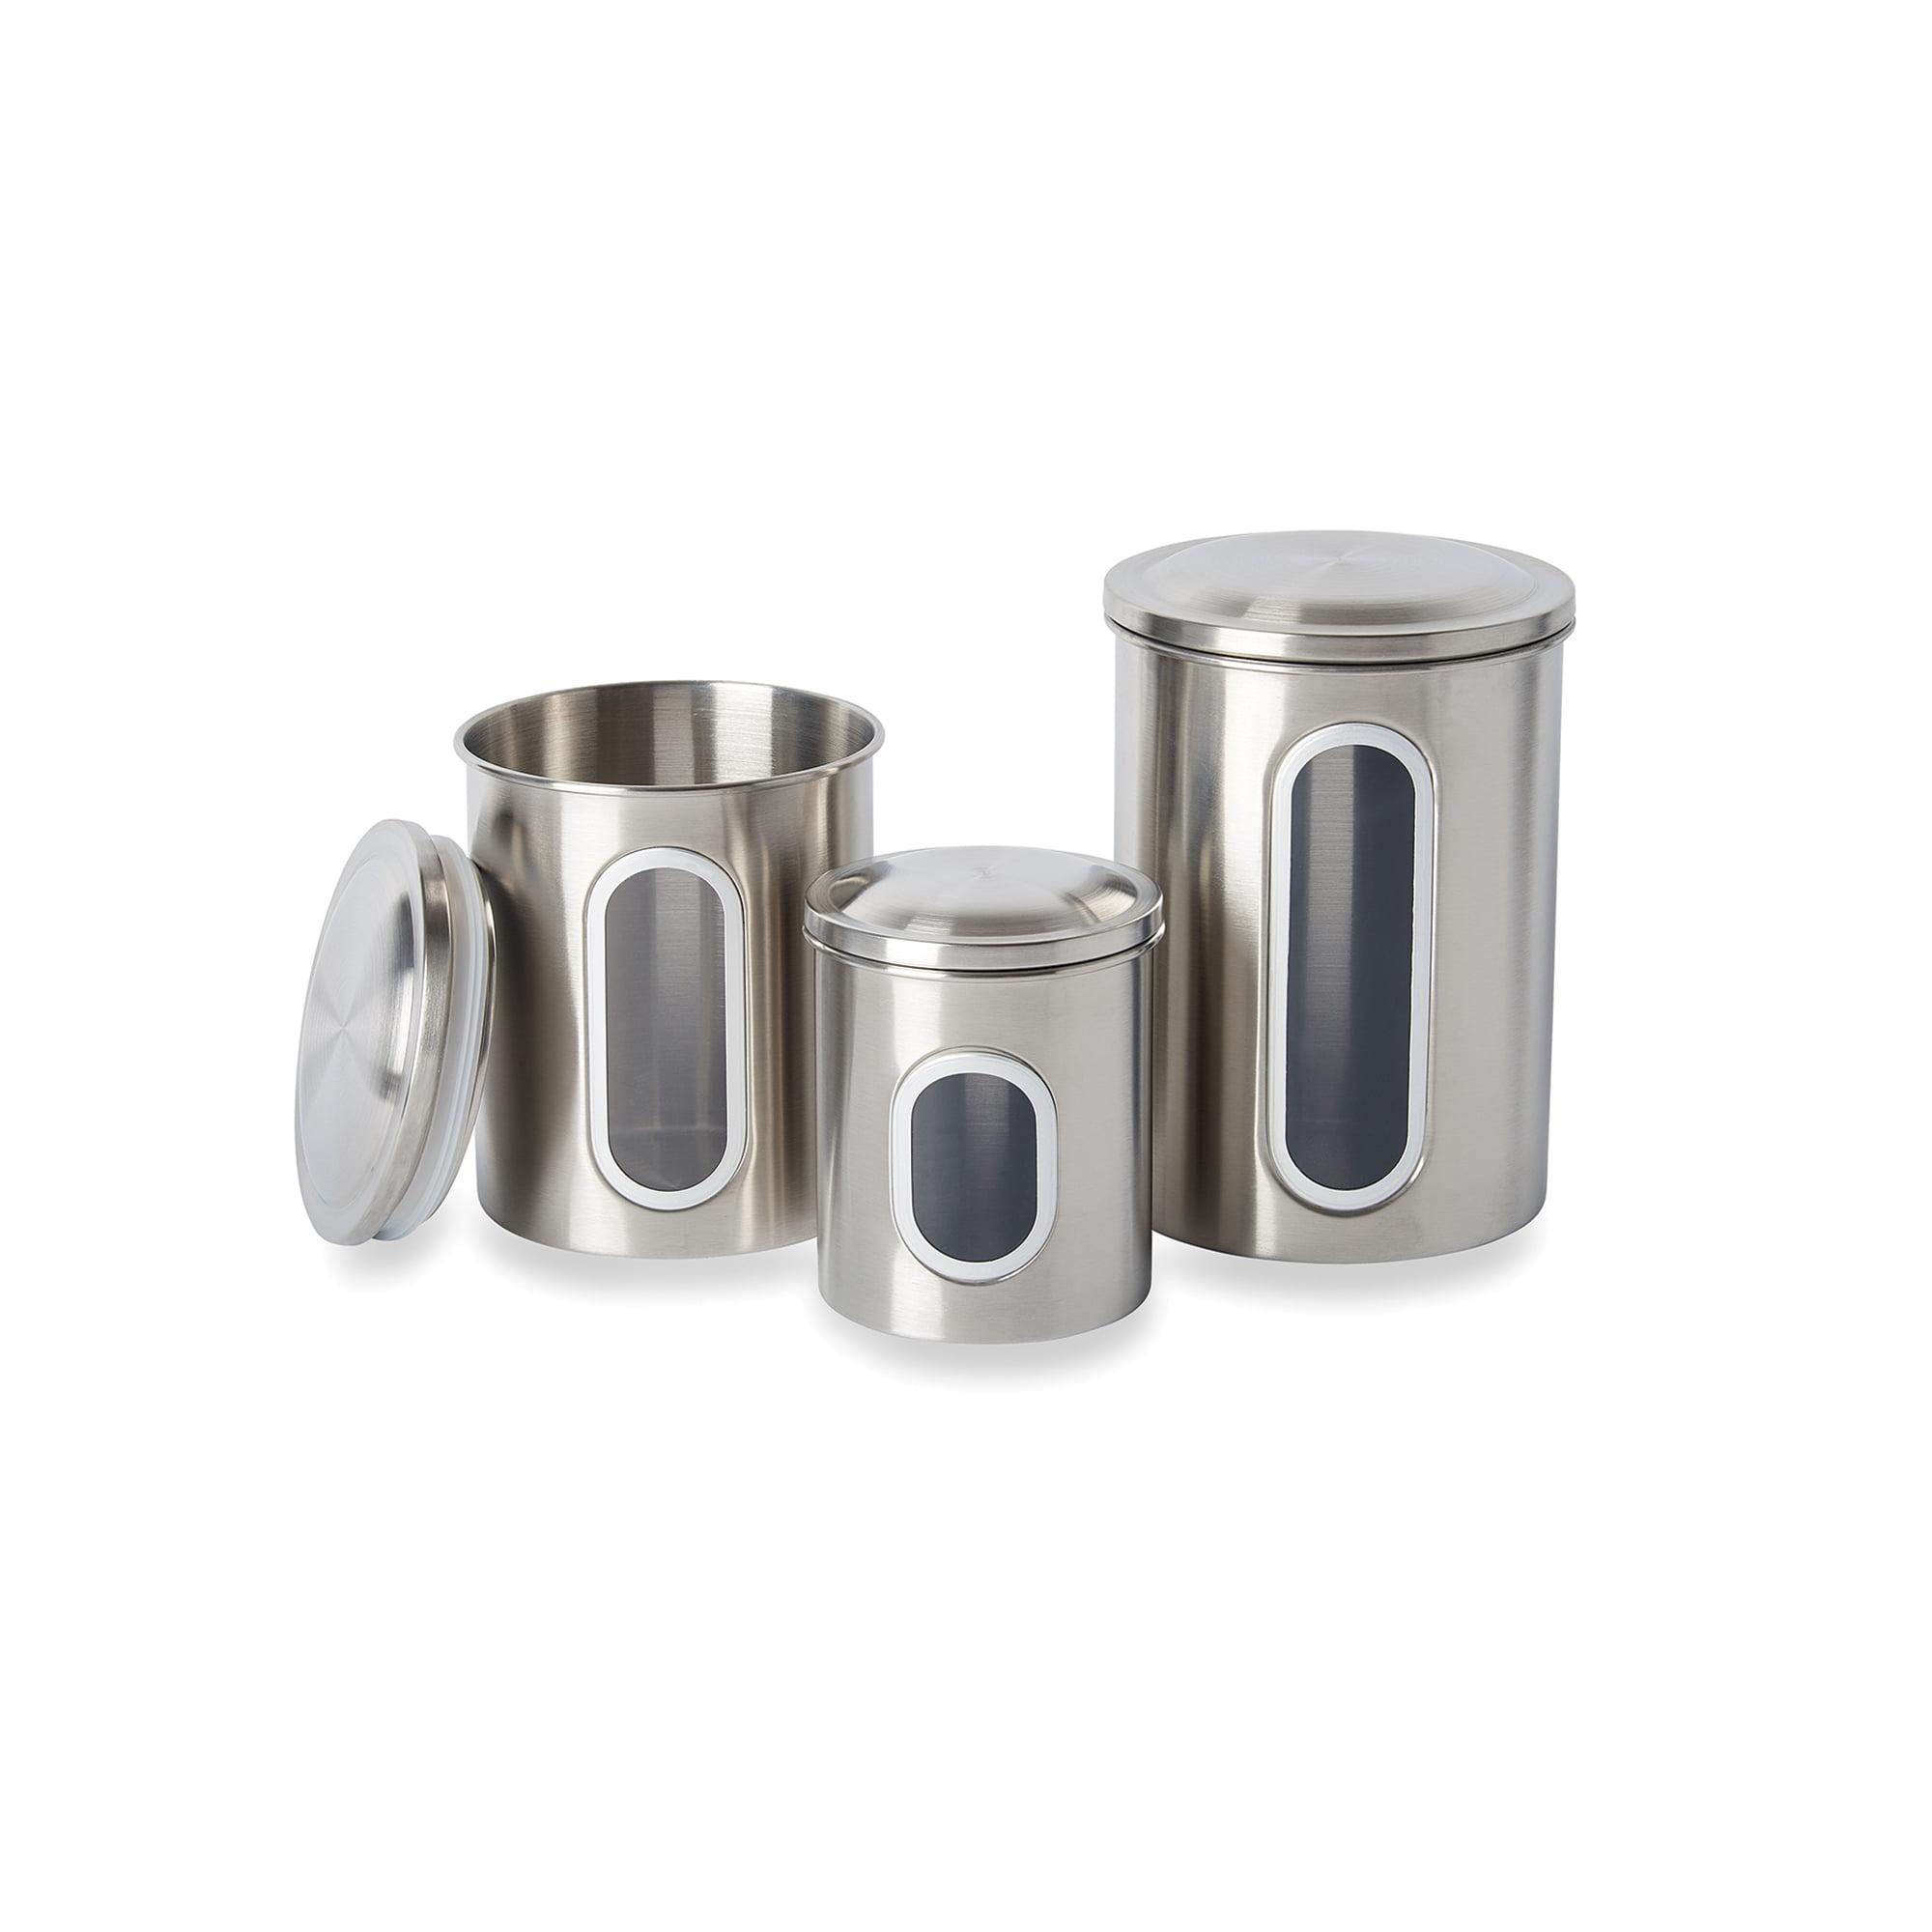 stainless steel canister set 3 piece. Black Bedroom Furniture Sets. Home Design Ideas